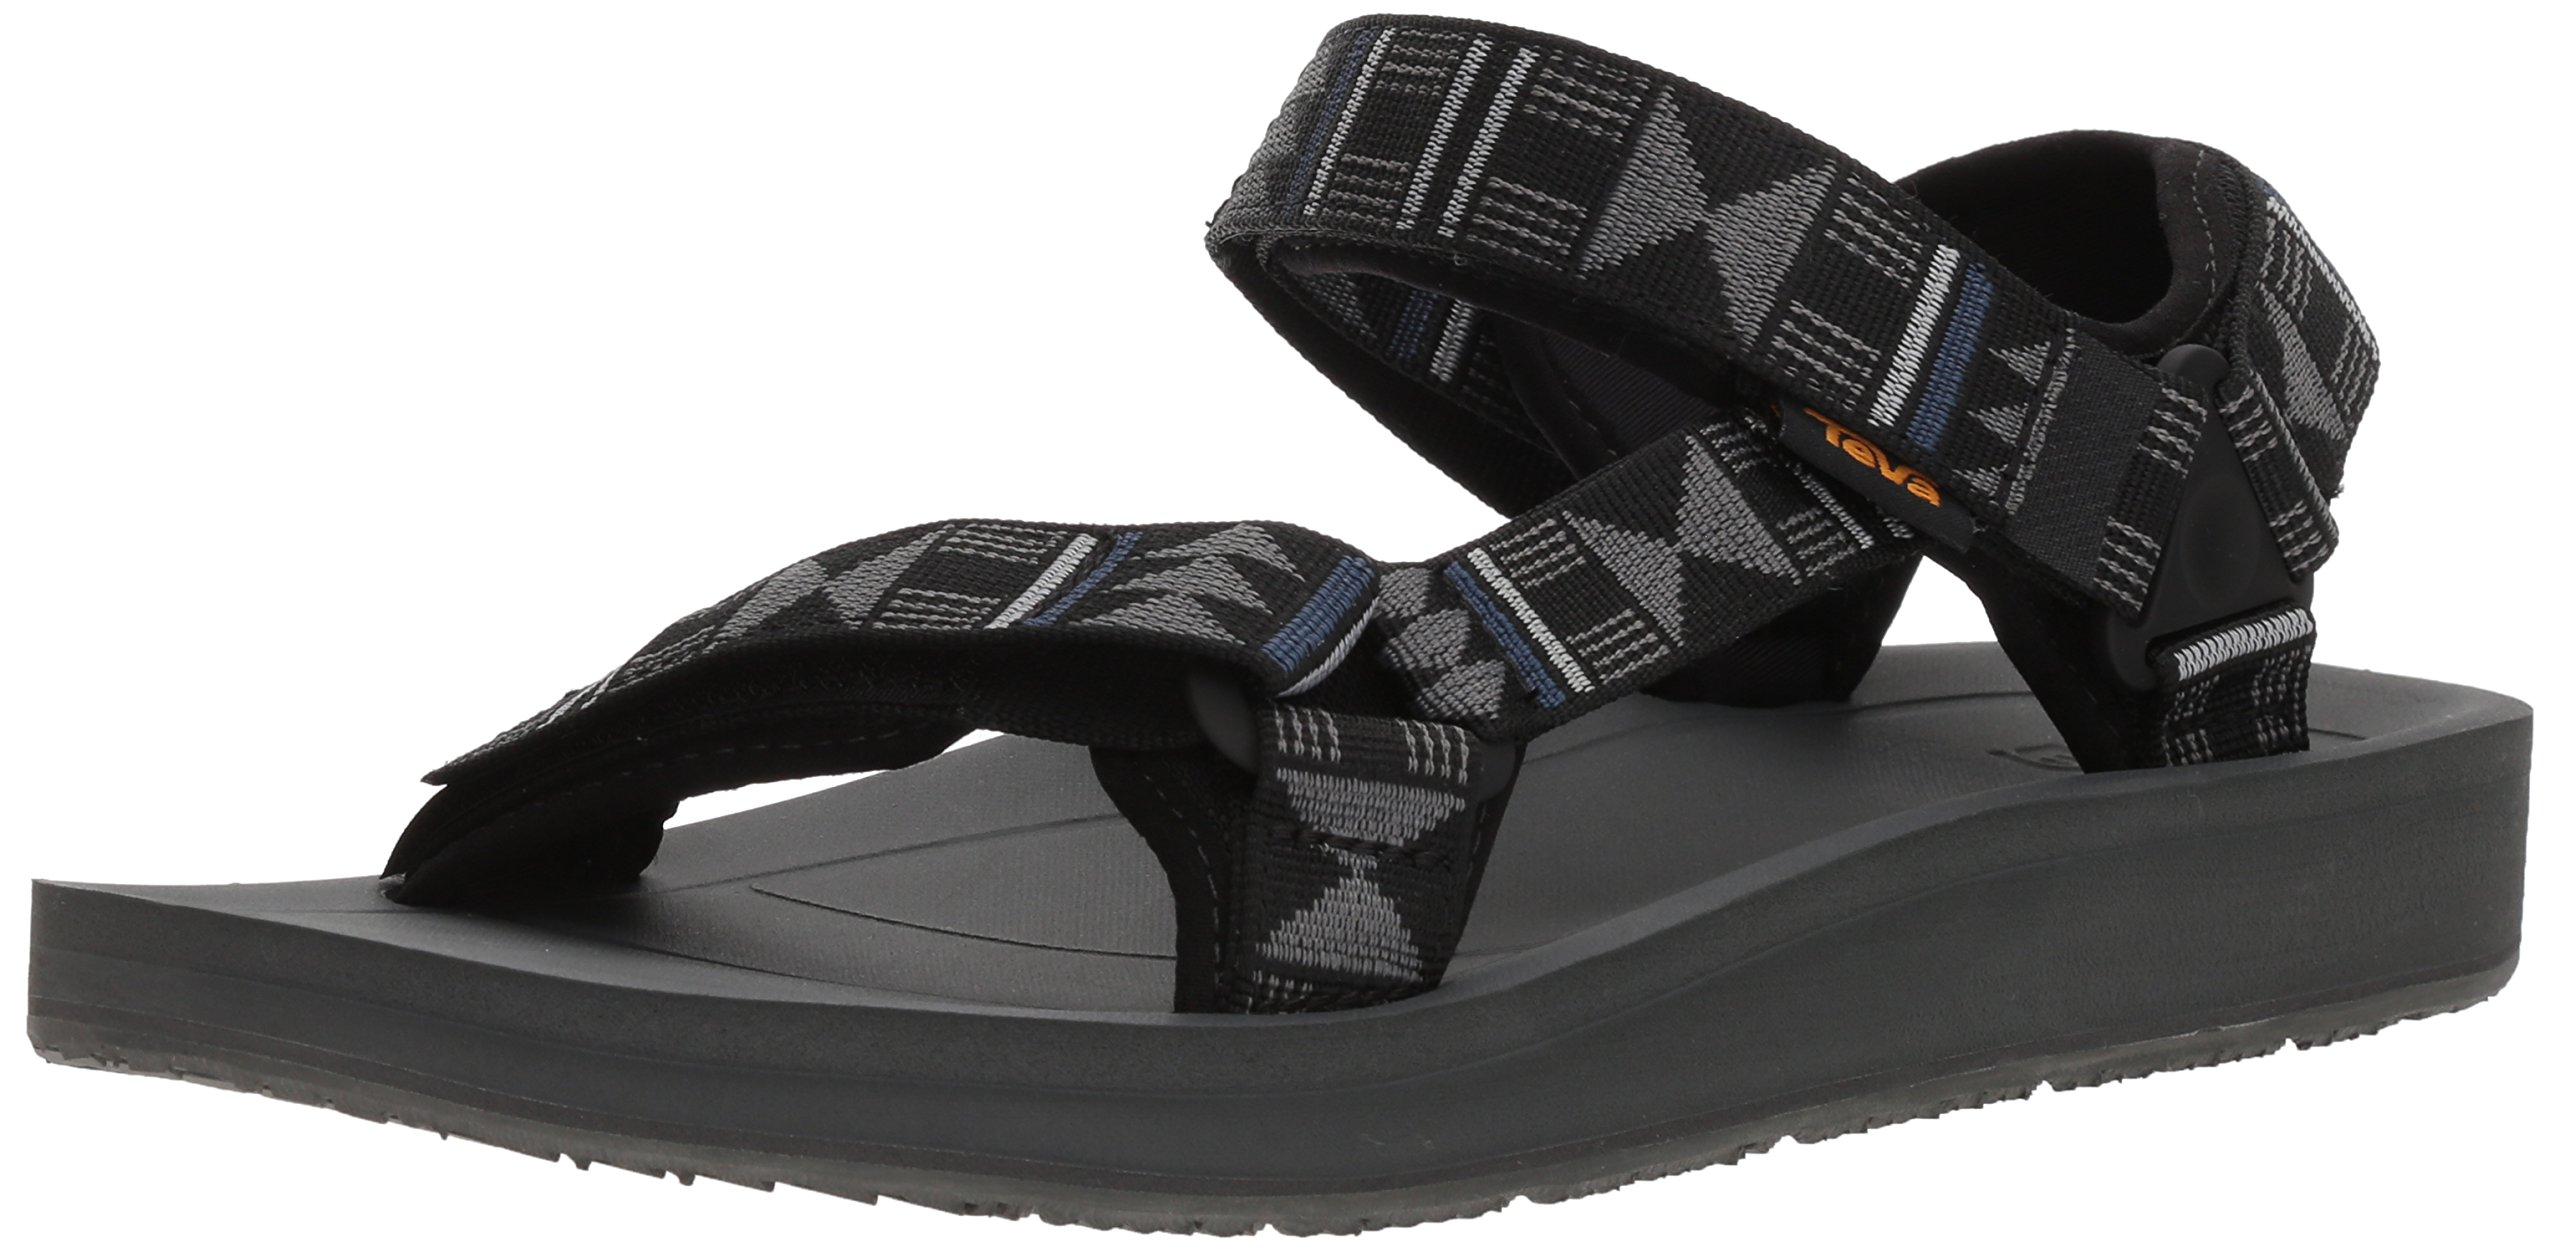 Teva Men's M Original Universal Premier Sport Sandal, Beach Break Grey, 9 M US by Teva